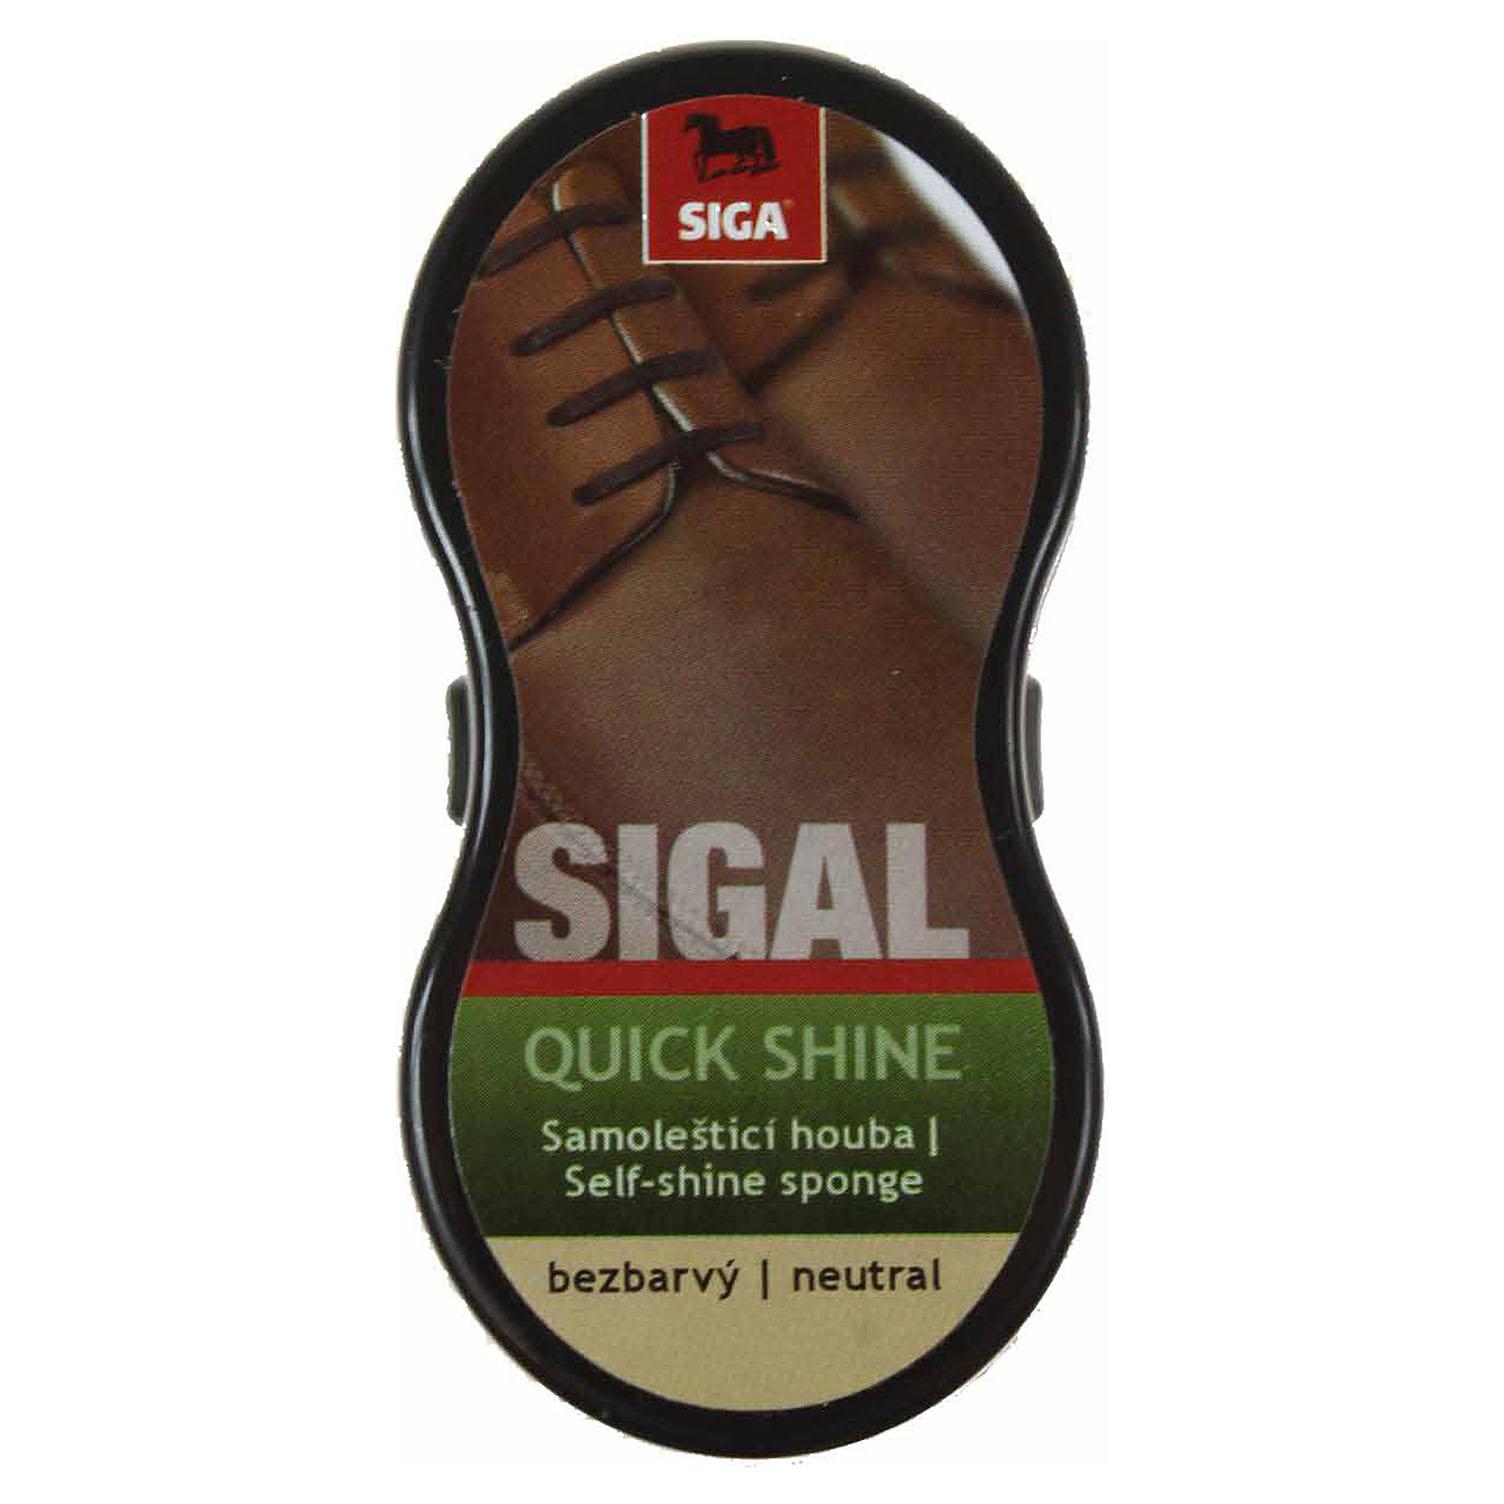 Sigal samoleštící houba malá - neutral Sigal samoleštící houba malá NO.7 - bezb